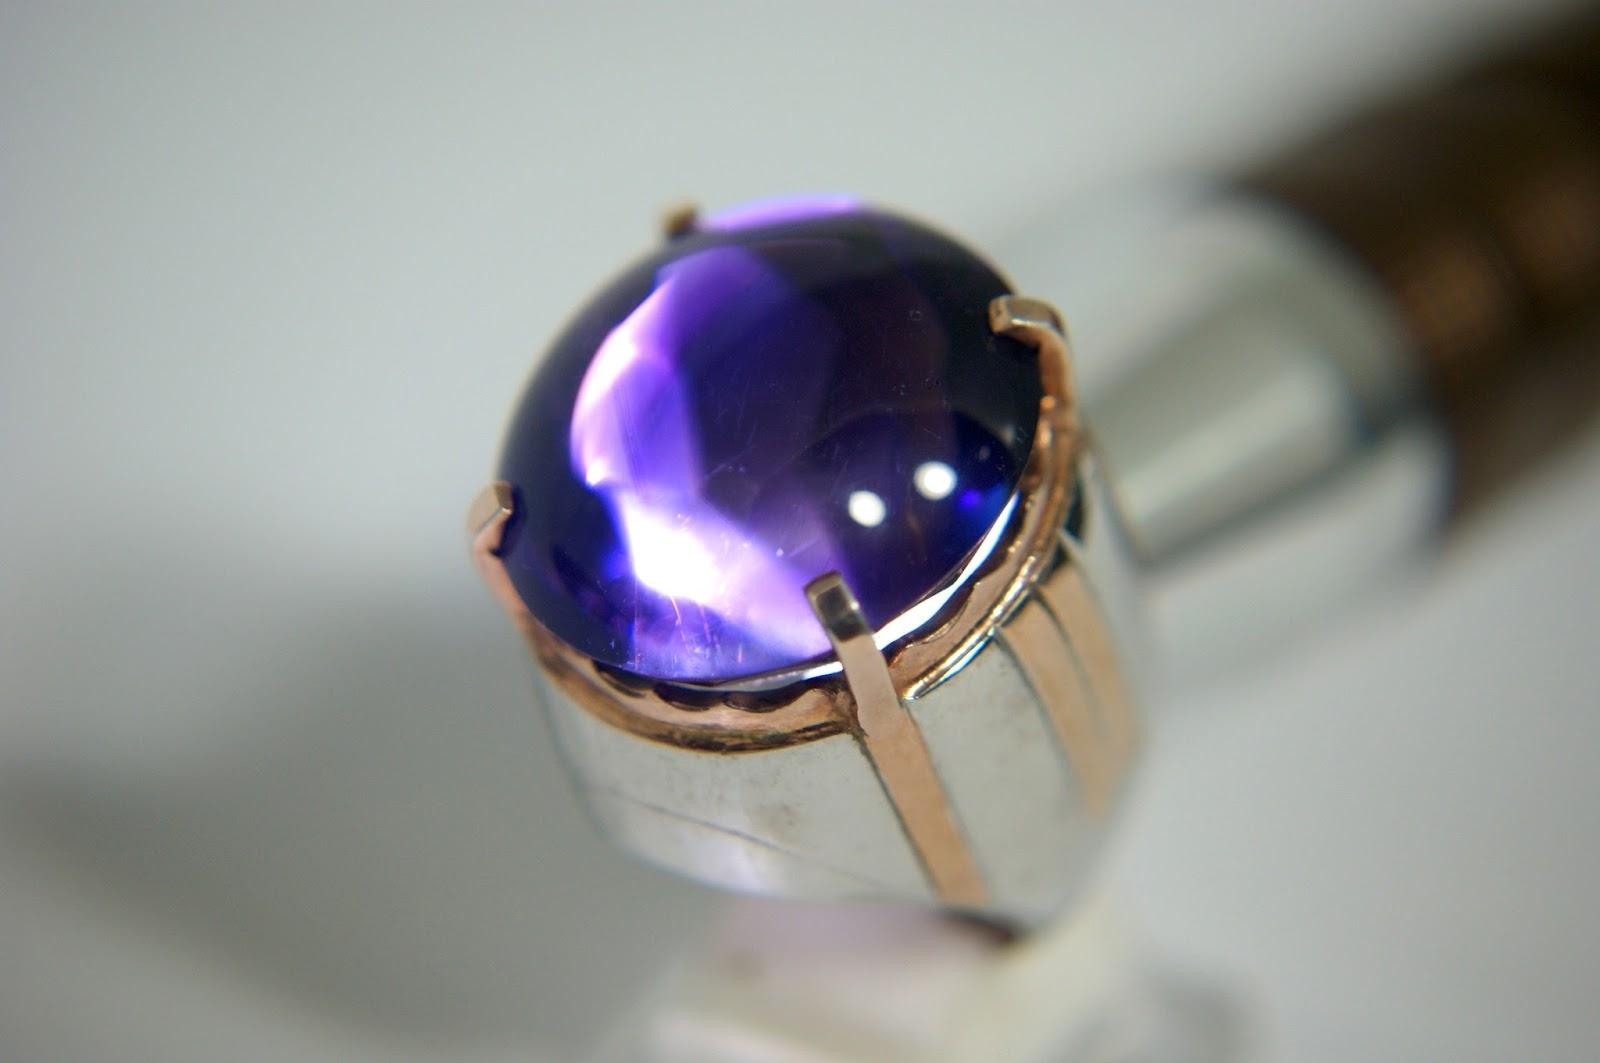 Kecubung Ungu Super Crystal